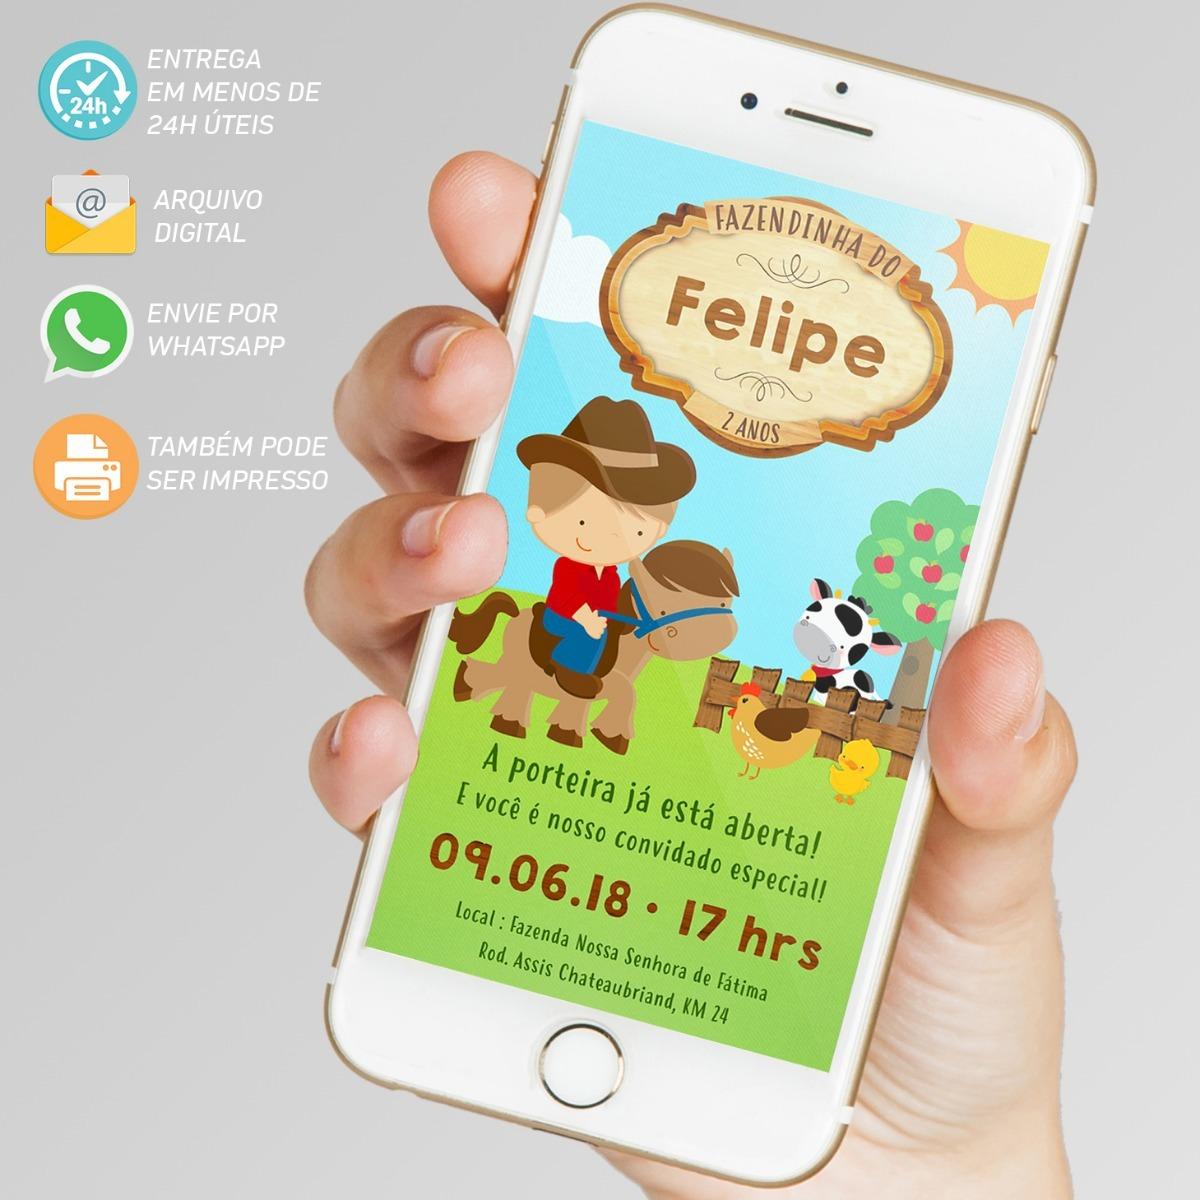 Convite Digital Fazendinha Menino Virtual Imprimir Whatsapp R